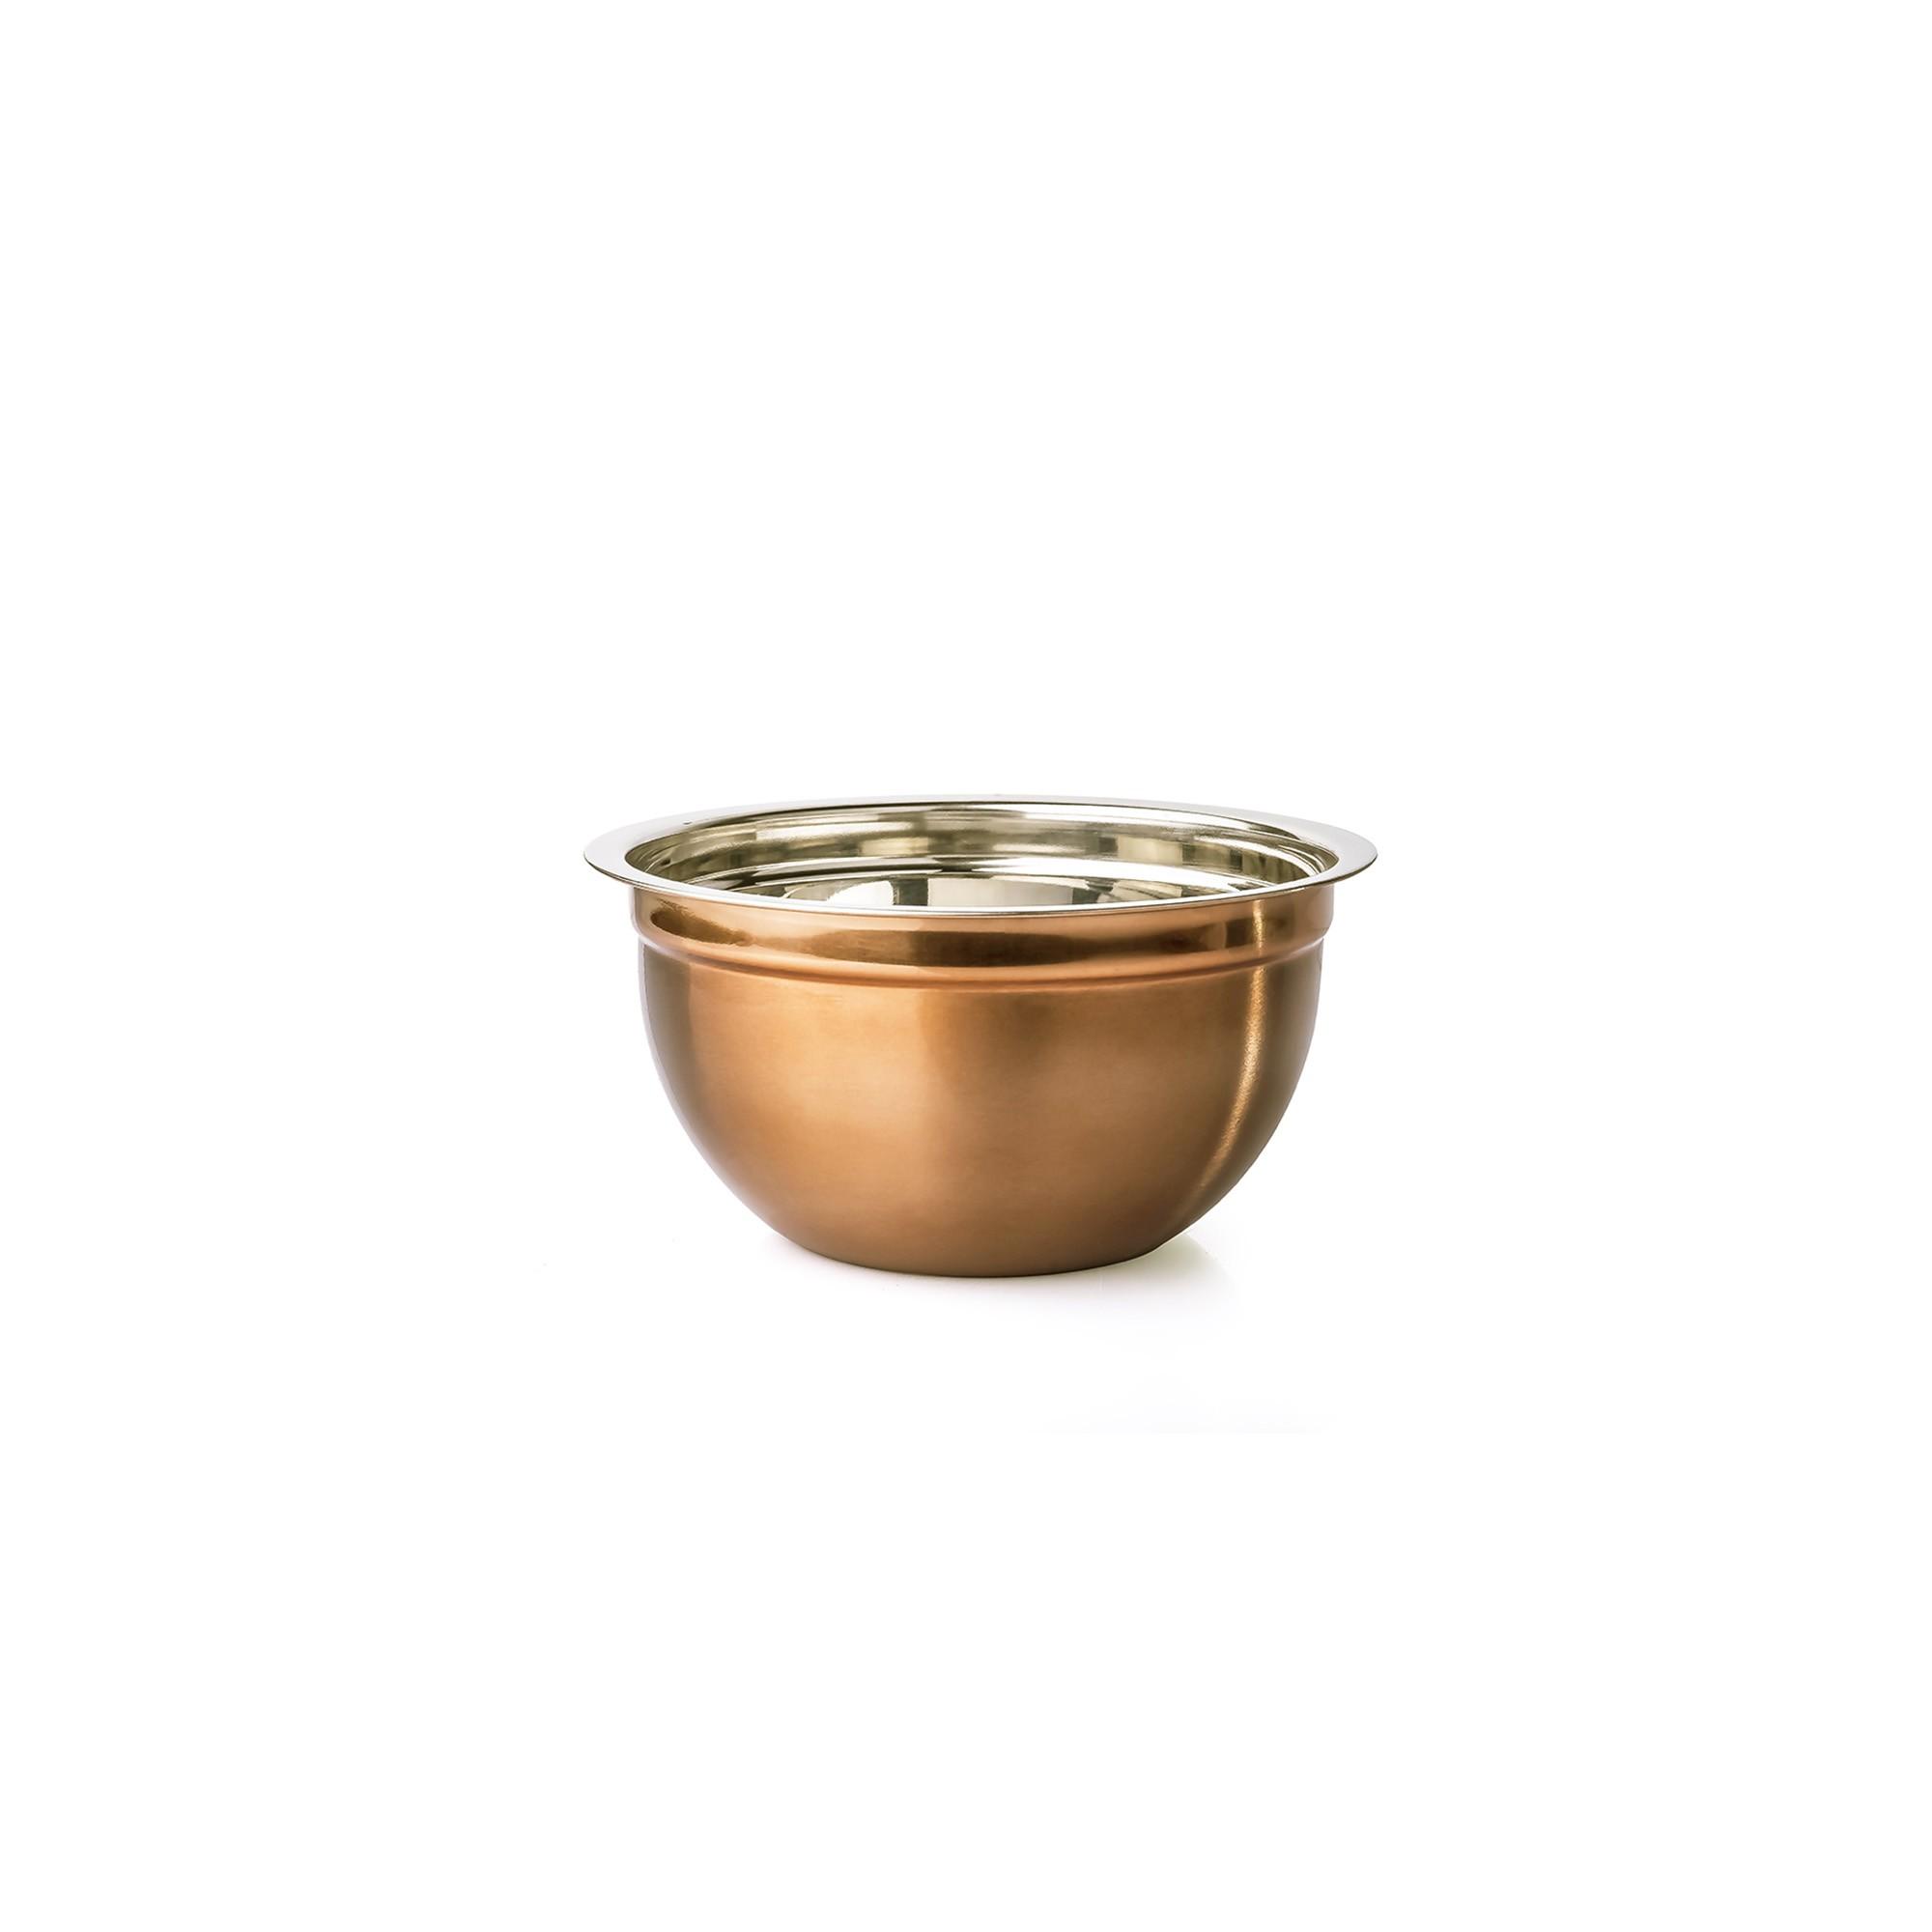 Bowl Cobre 1,5 Litros Inox Attuale